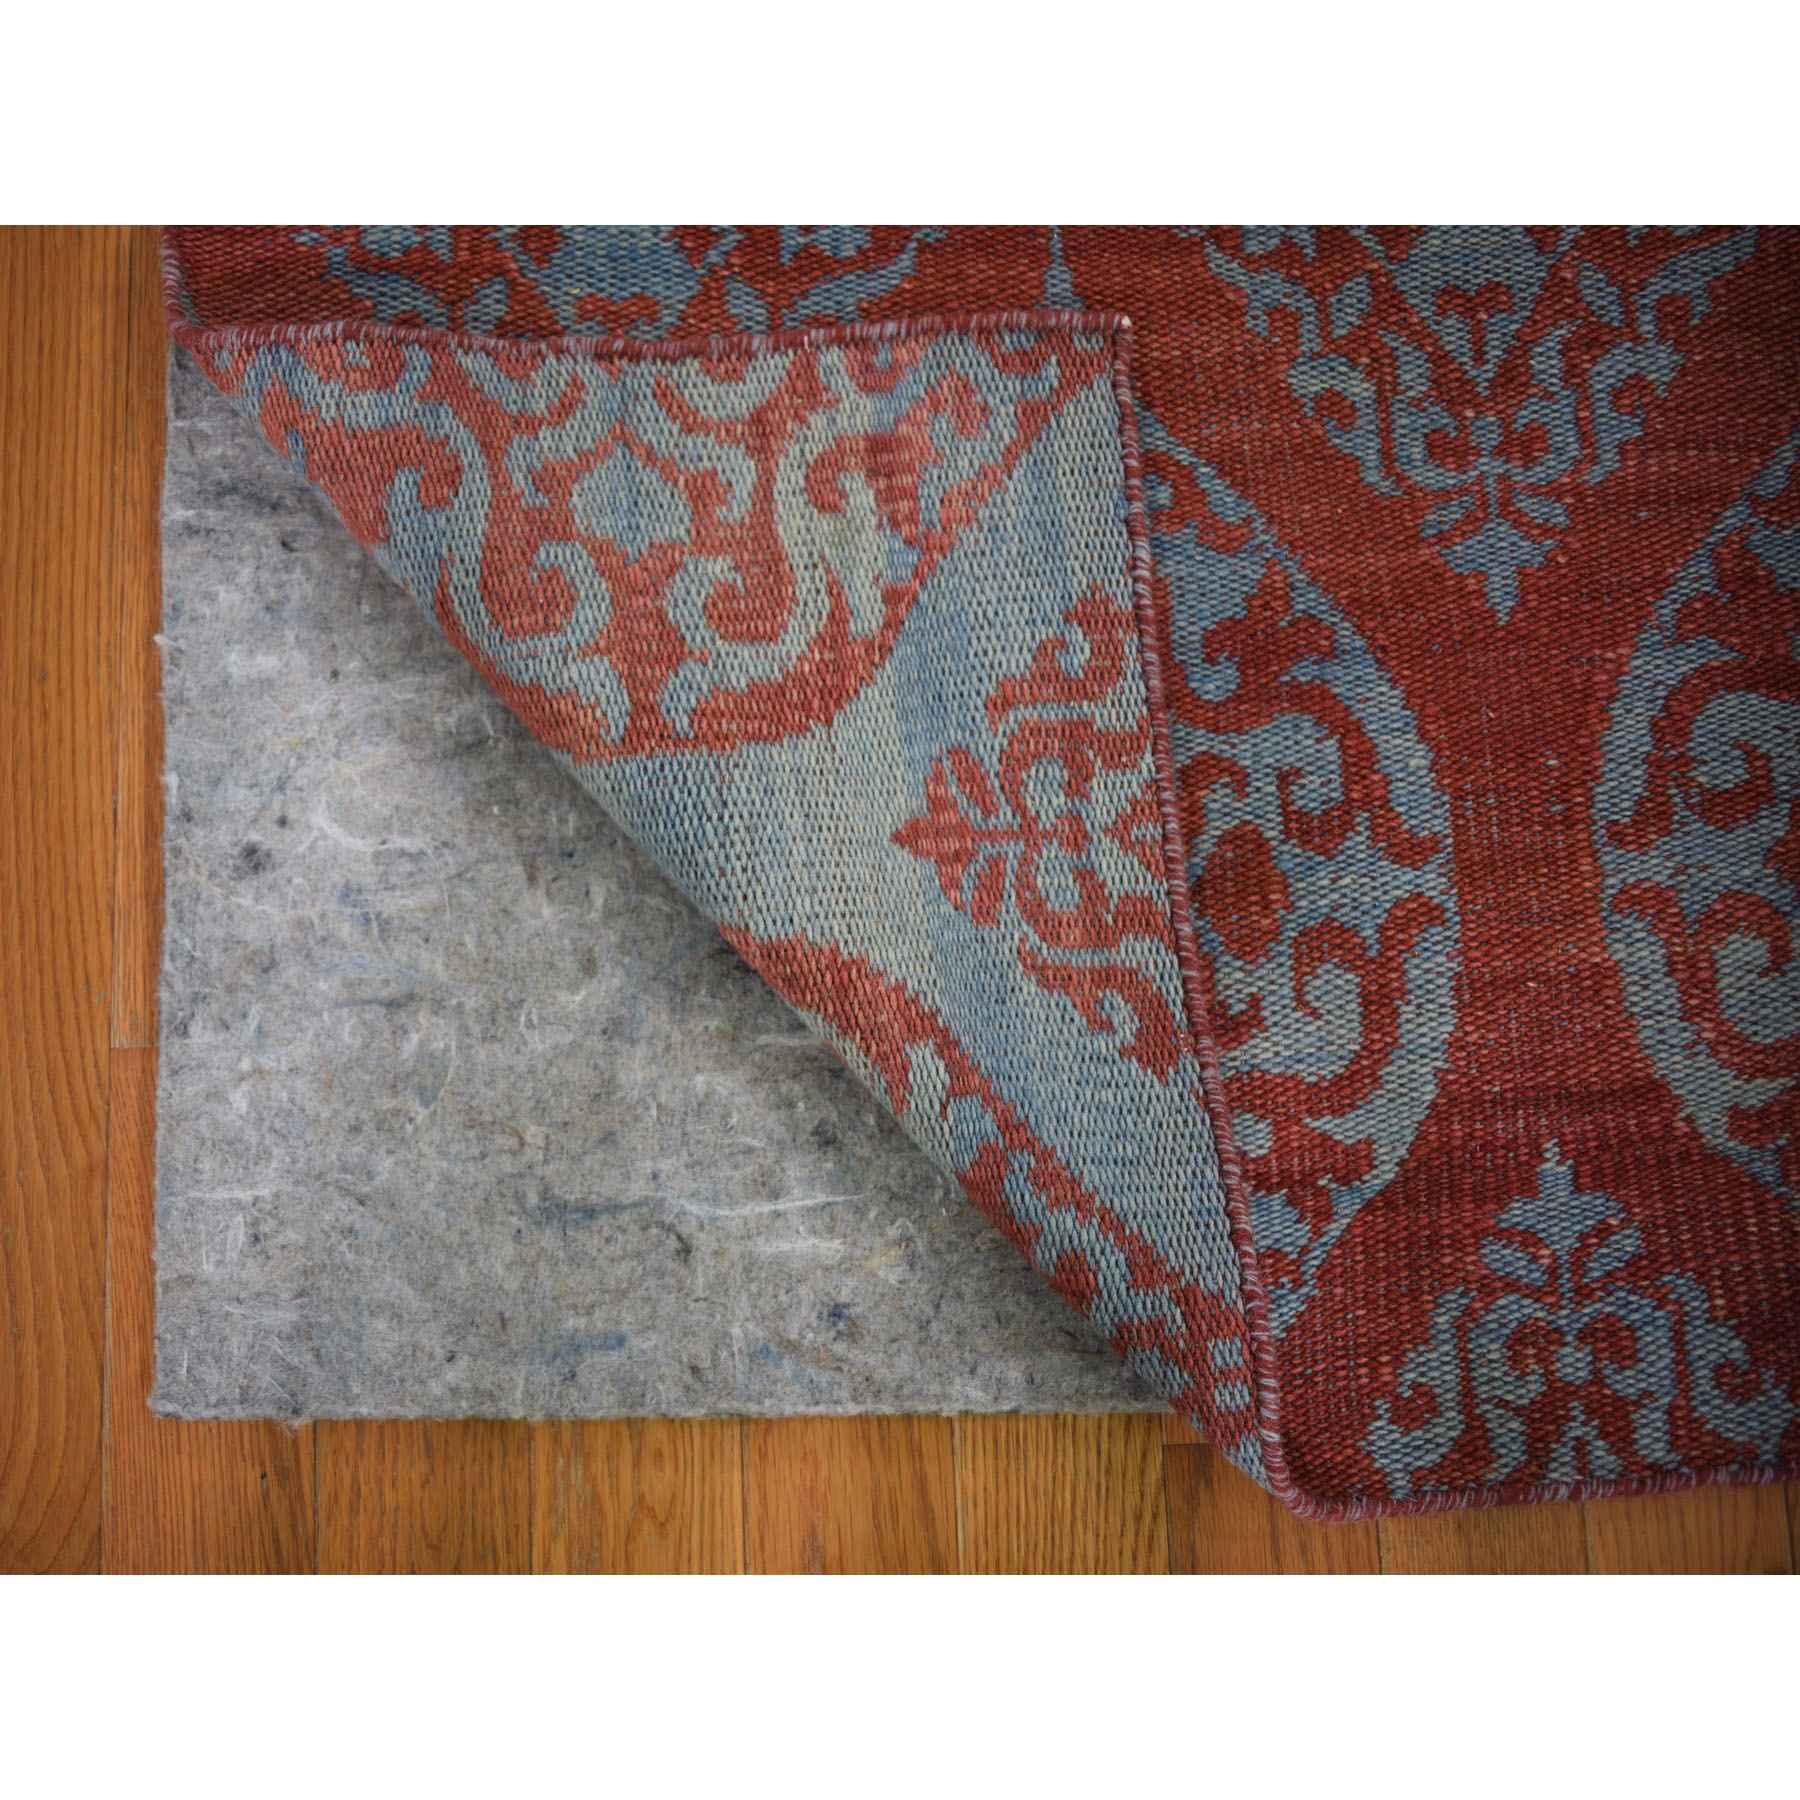 2-6 x9-1  Hand Woven Flat Weave Pure Wool Reversible Kilim Runner Oriental Rug